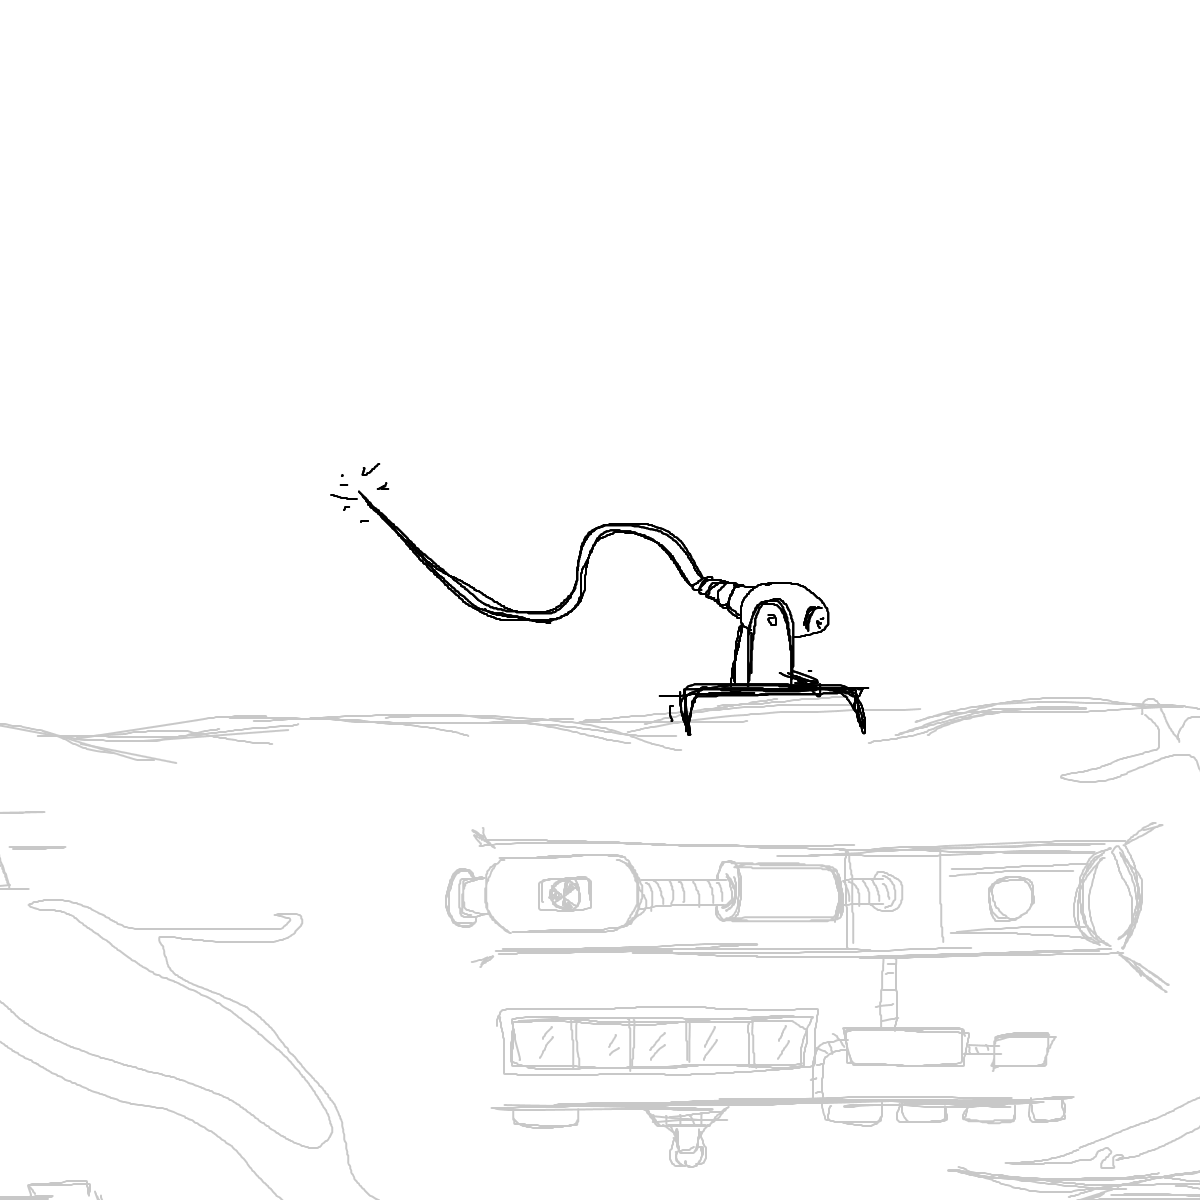 BAAAM drawing#4681 lat:39.7171287536621100lng: -75.6447677612304700